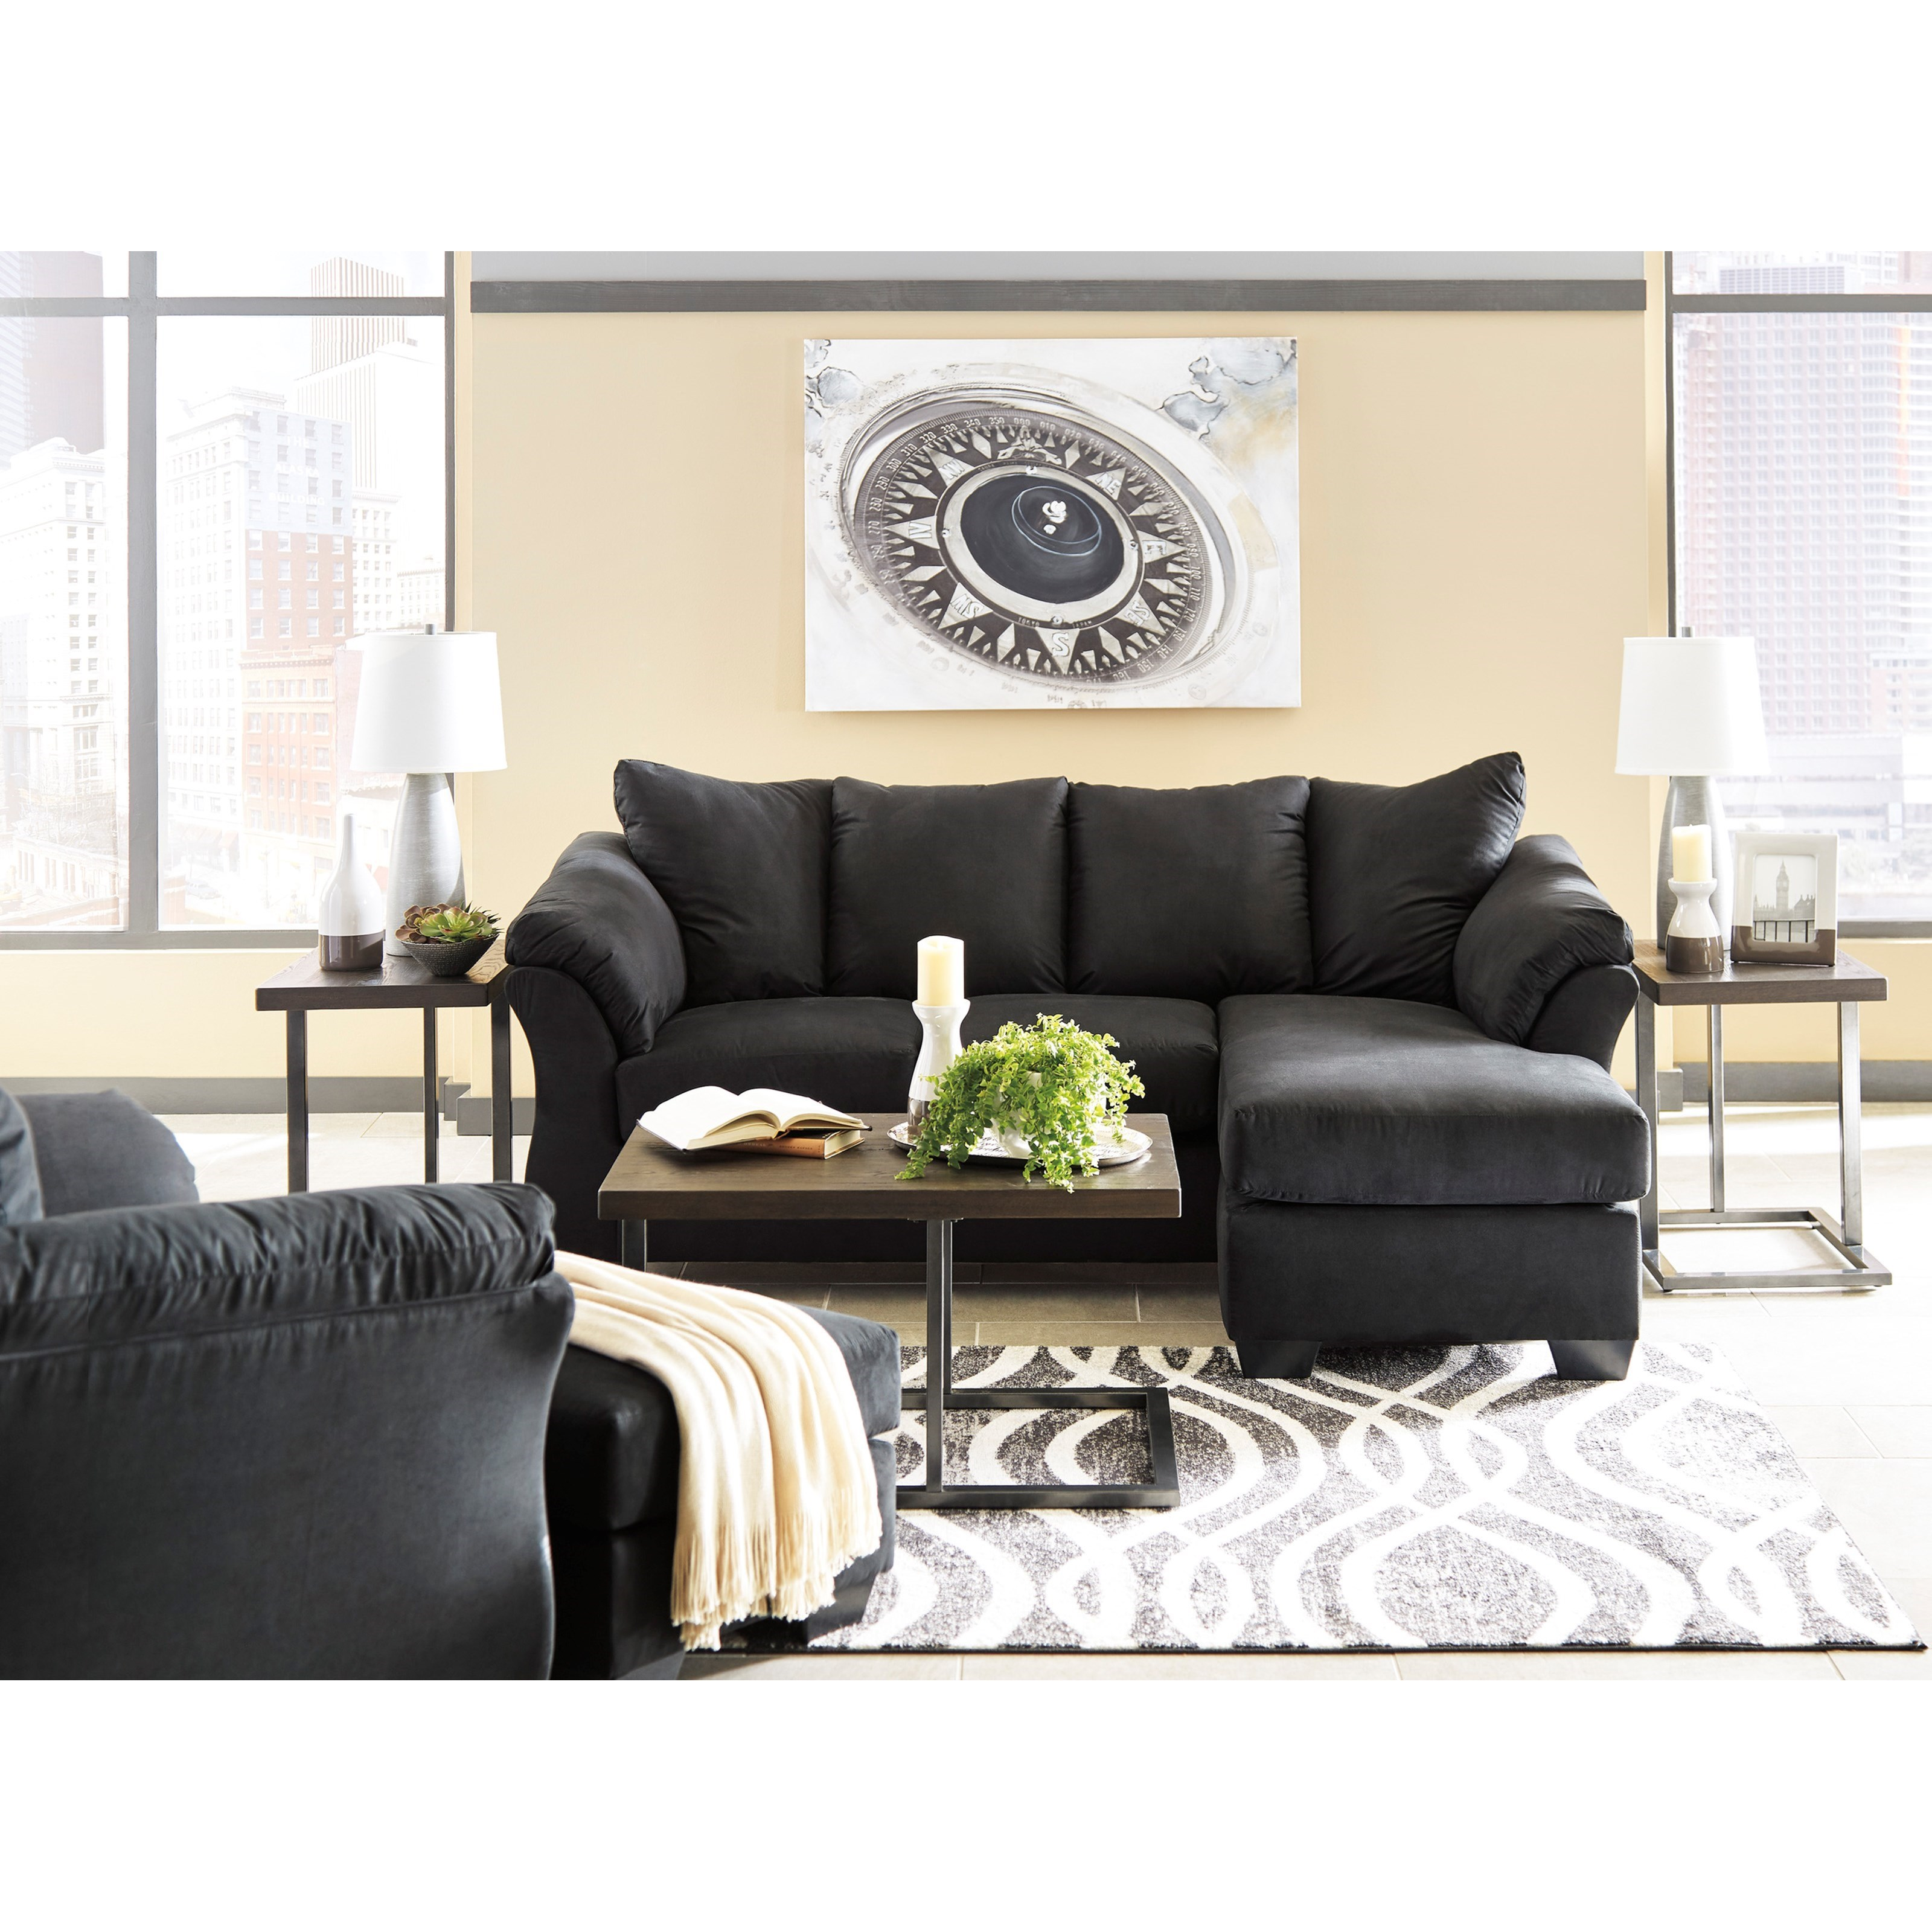 darcy sofa chaise ashley furniture dakota corner bed signature design black contemporary